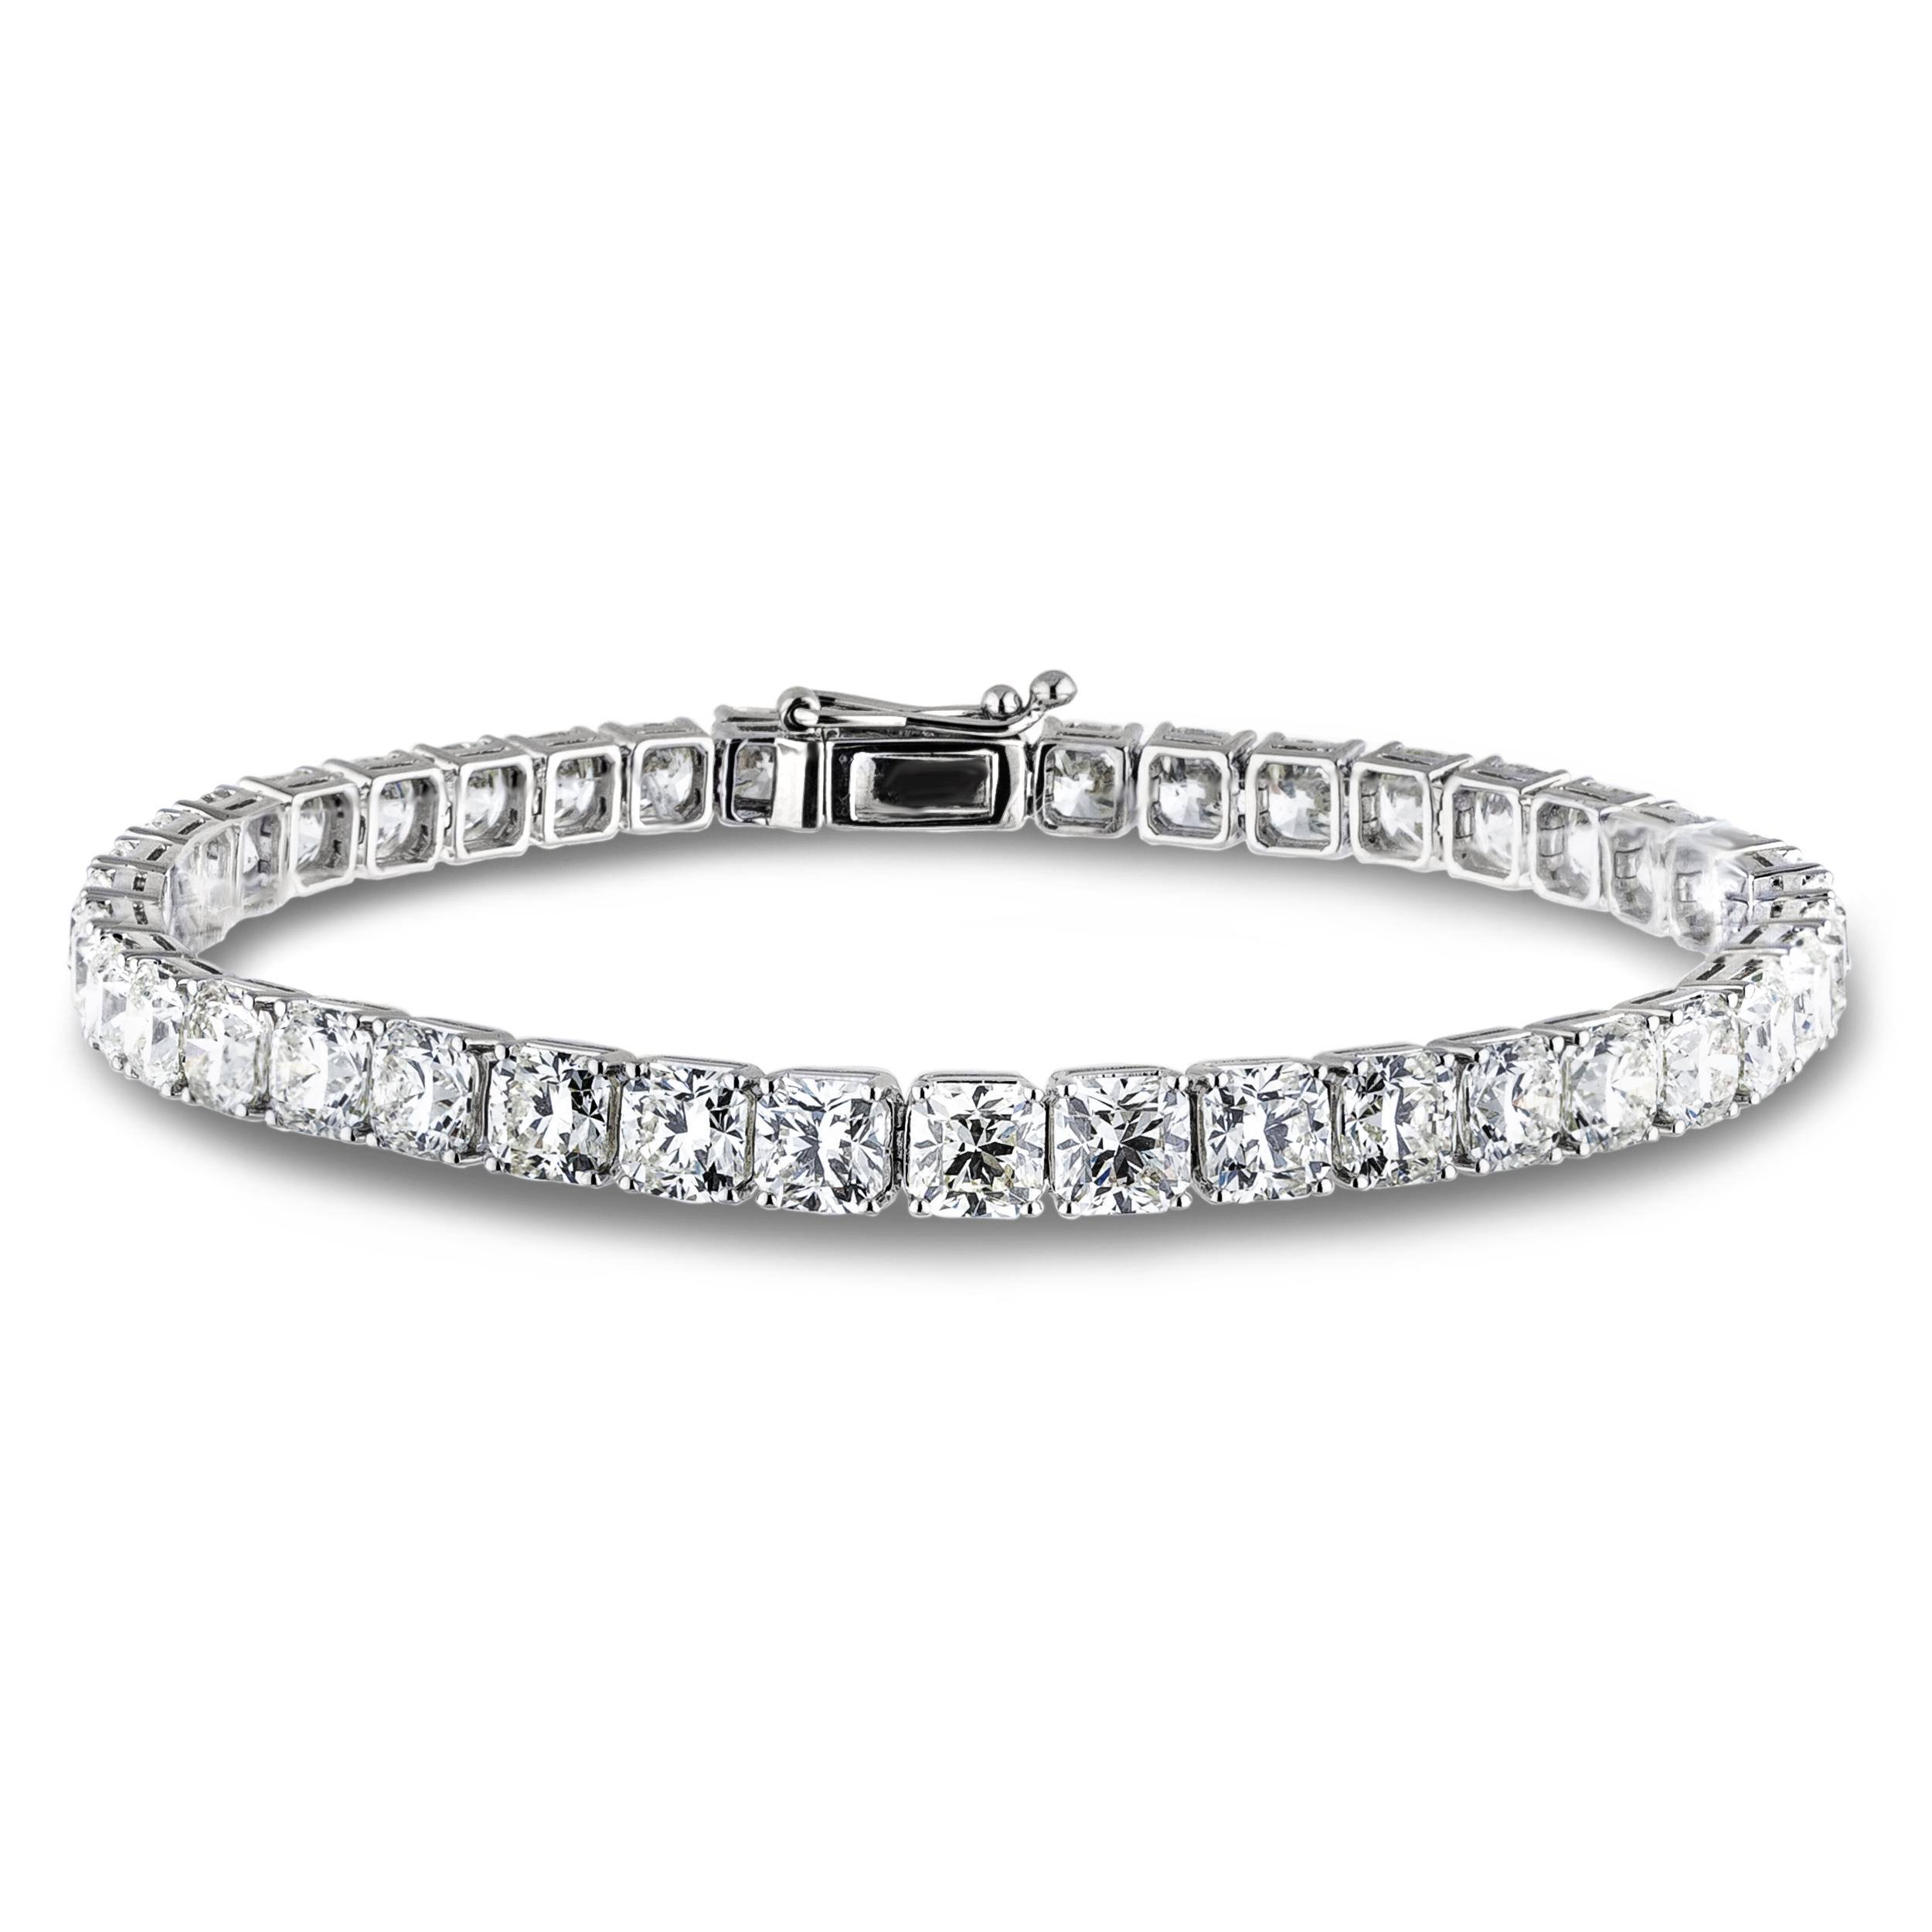 Diamond Tennis Bracelets SGB96 (Bracelets)